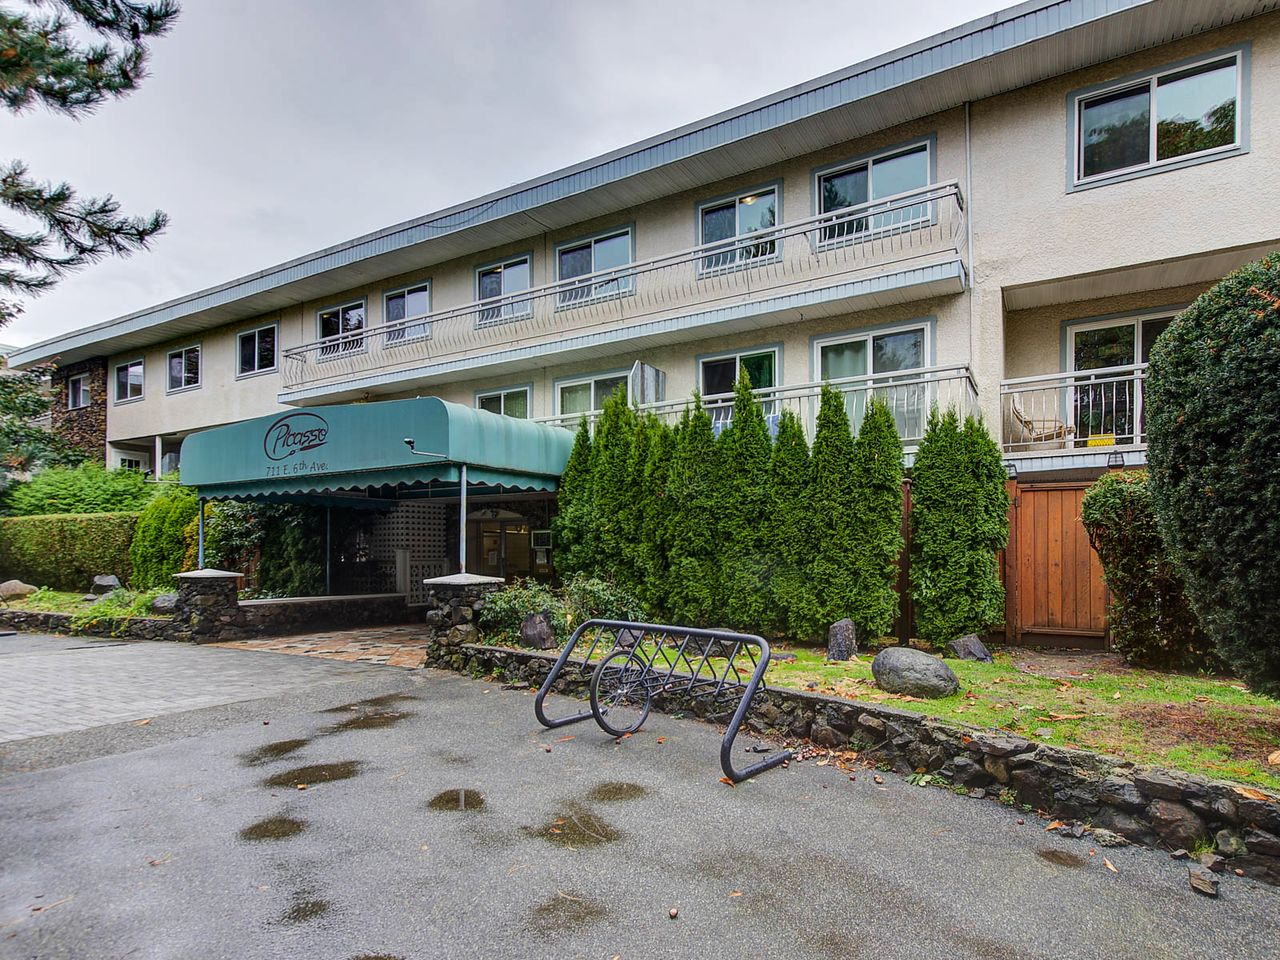 202-711-e-6th-ave-03 at 202 - 711 E. 6th Avenue, Mount Pleasant VE, Vancouver East